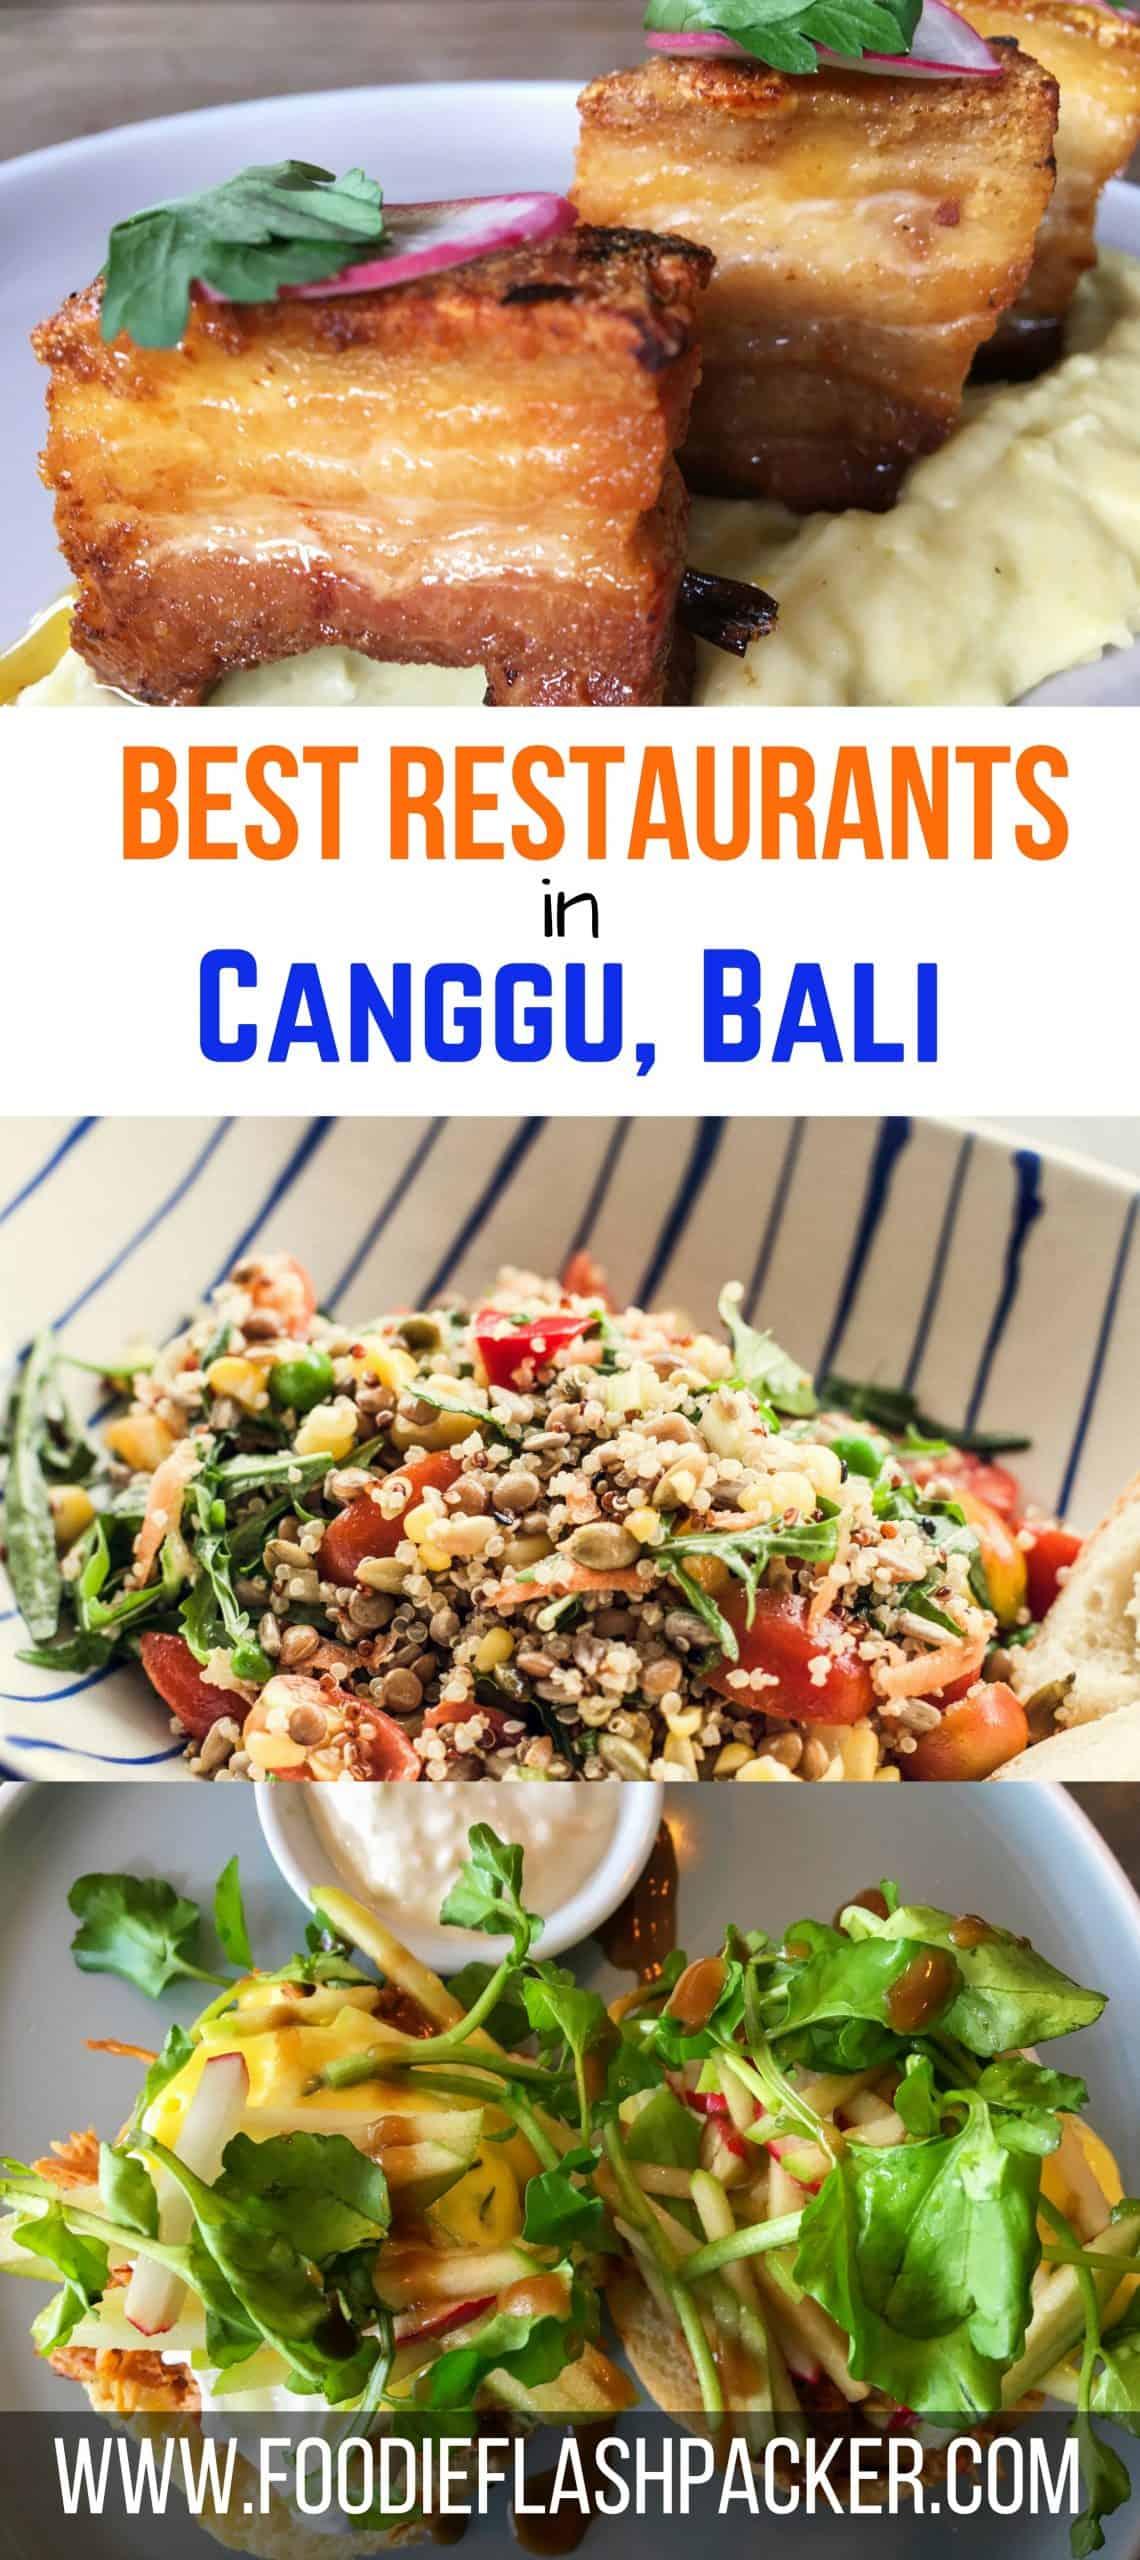 Best Restaurants in Canggu Bali